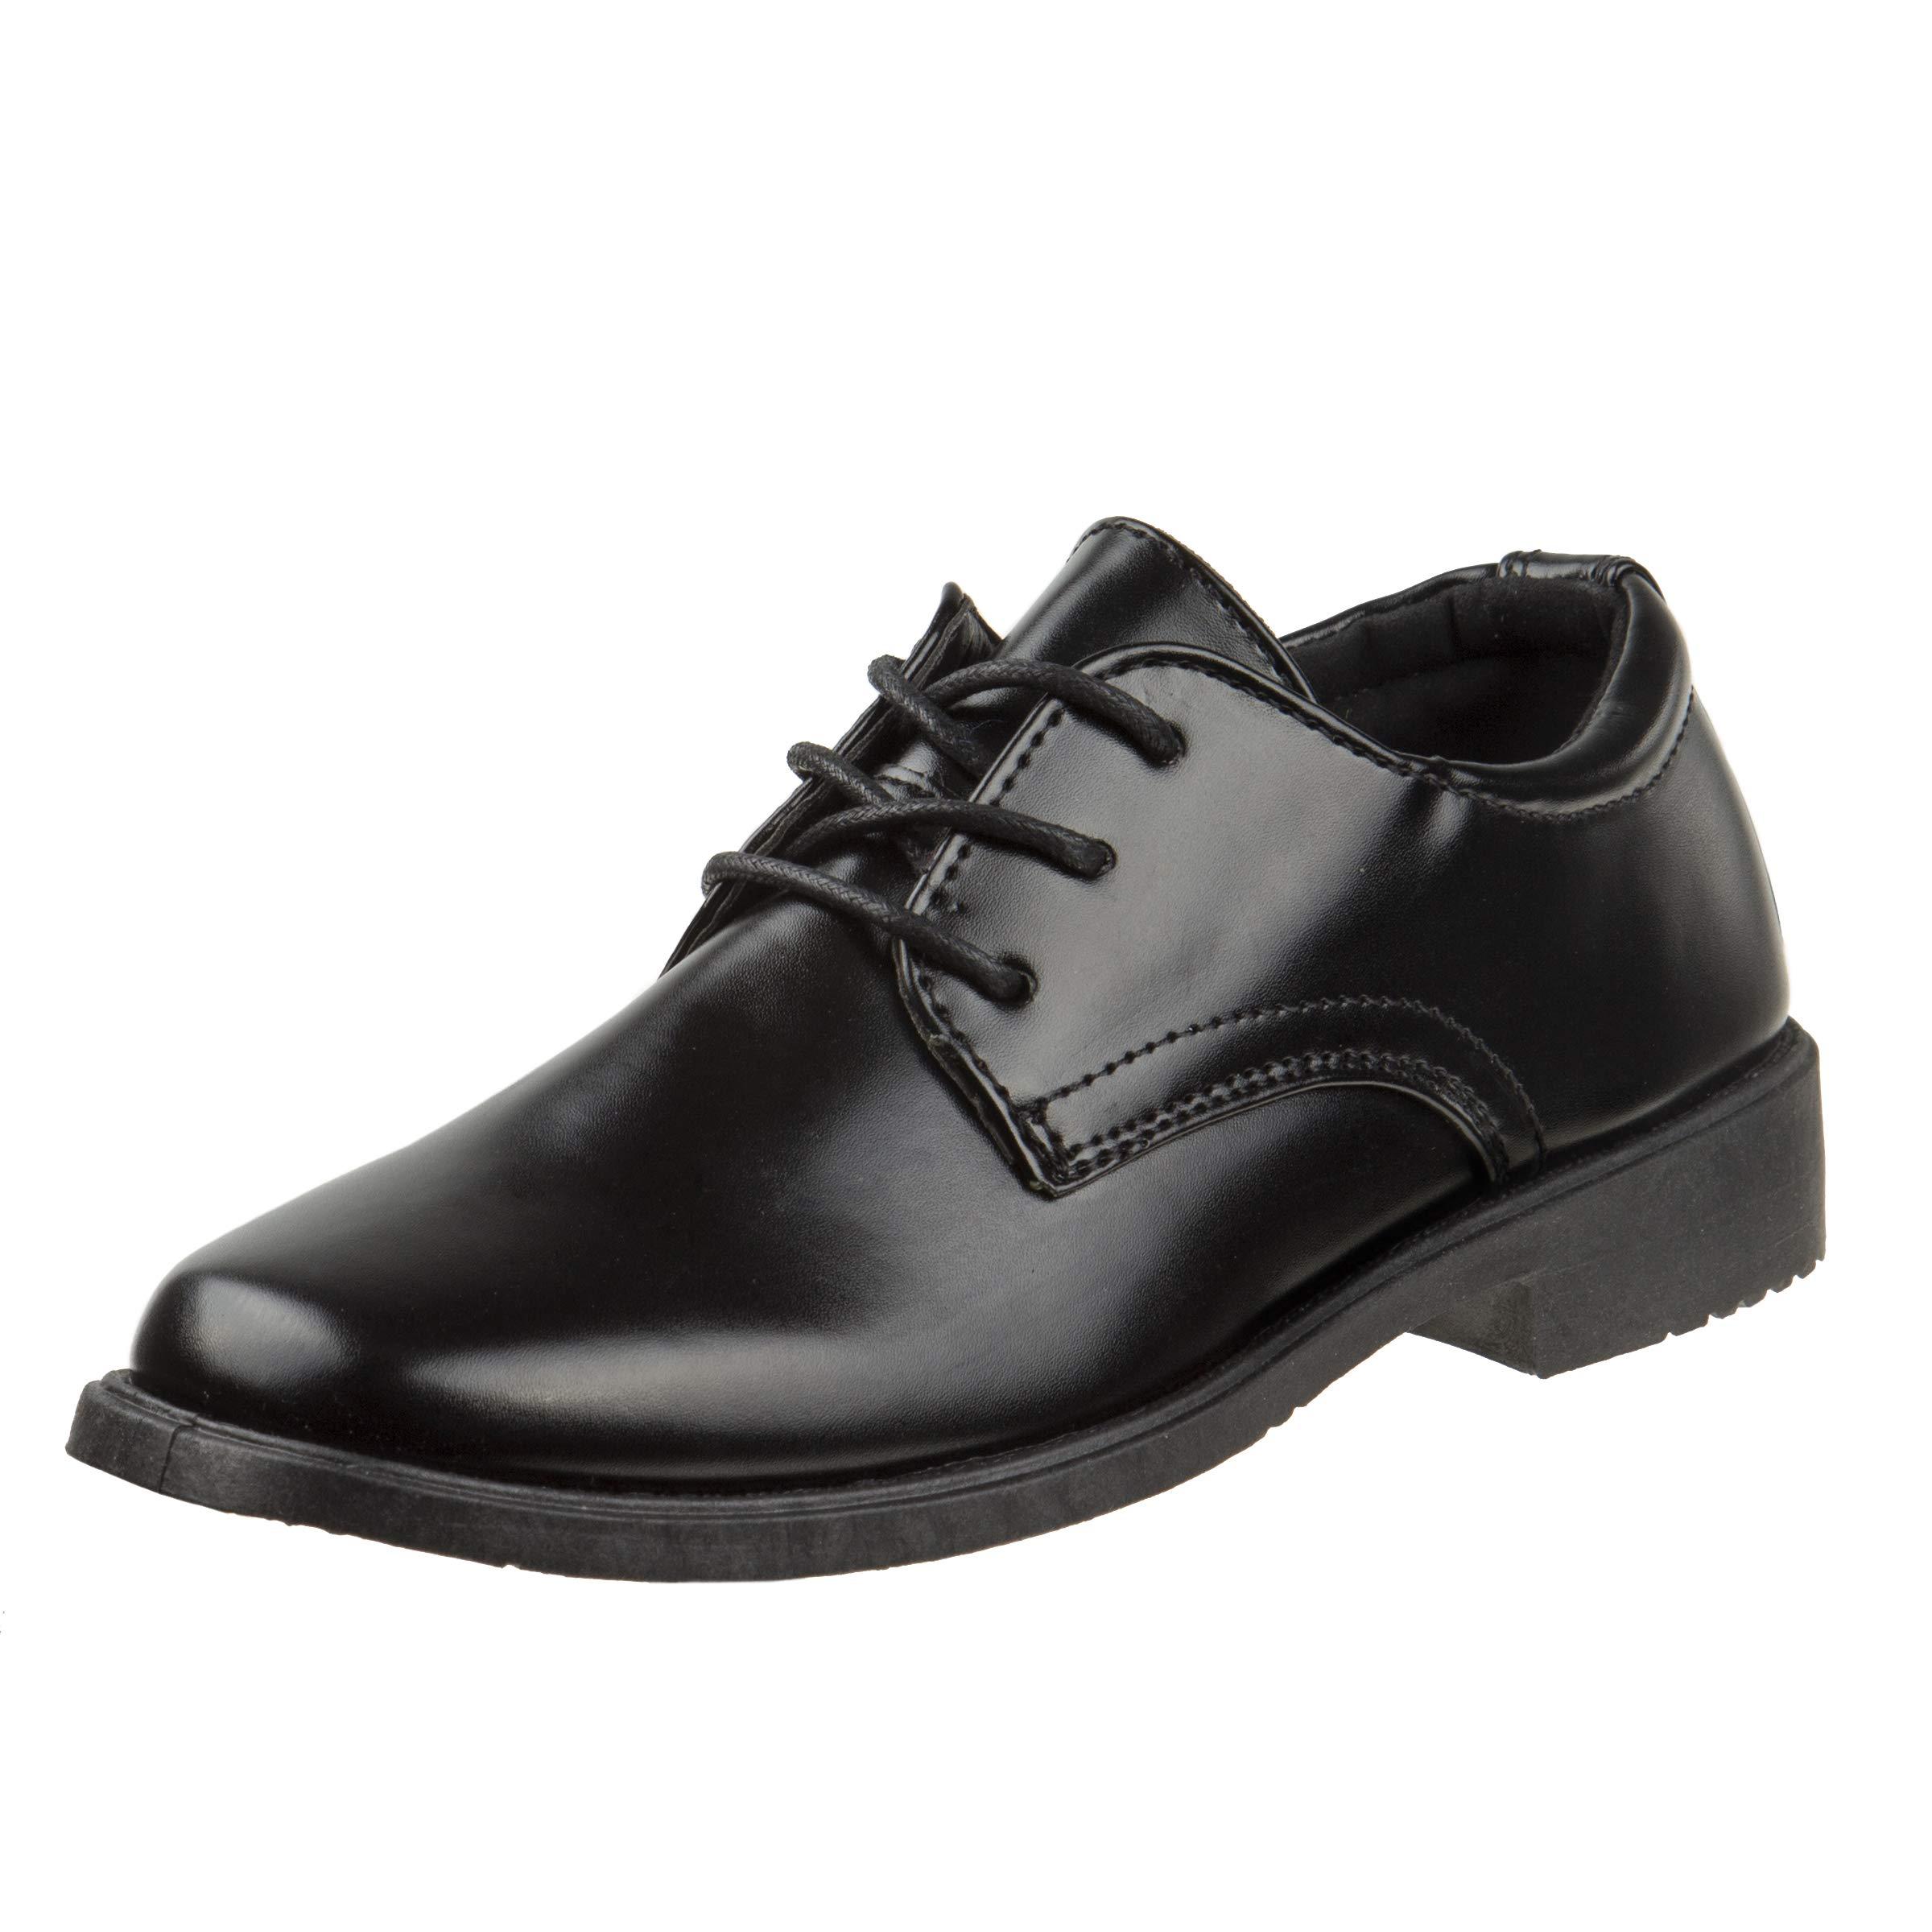 Josmo Boys Basic Oxford Casual Dress Shoe, Black, Size 5'